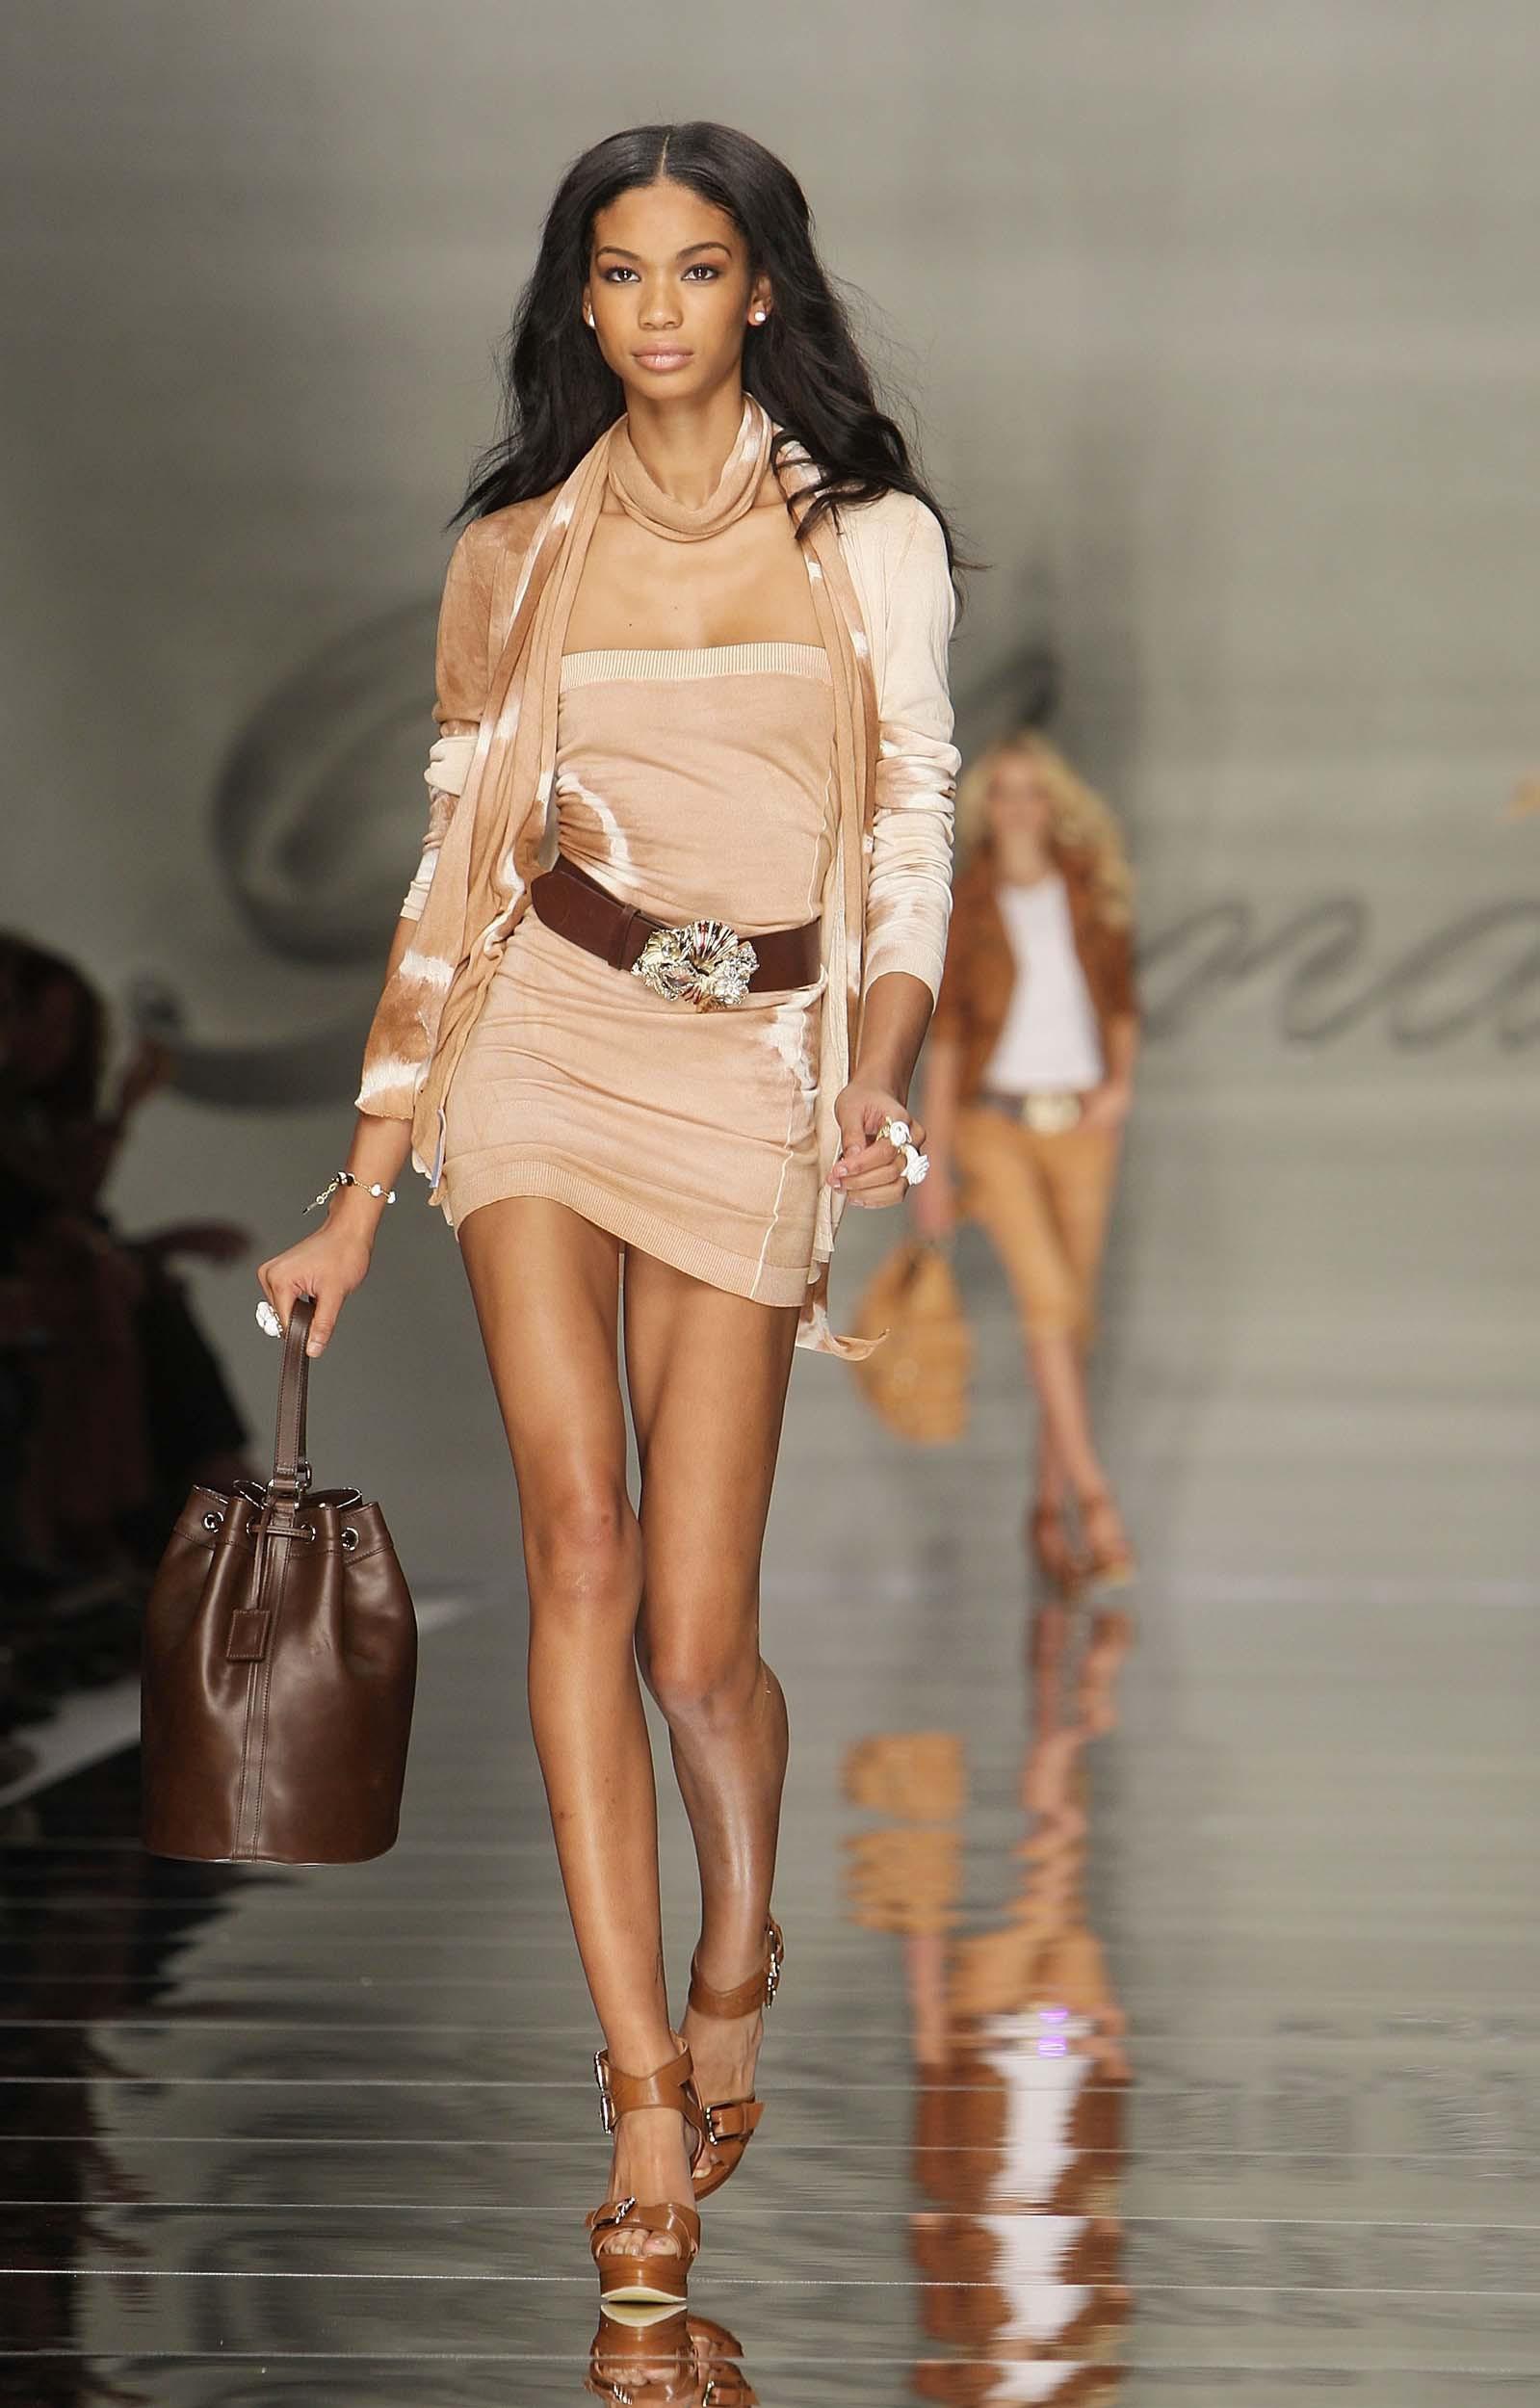 Chanel Iman Wallpapers HD